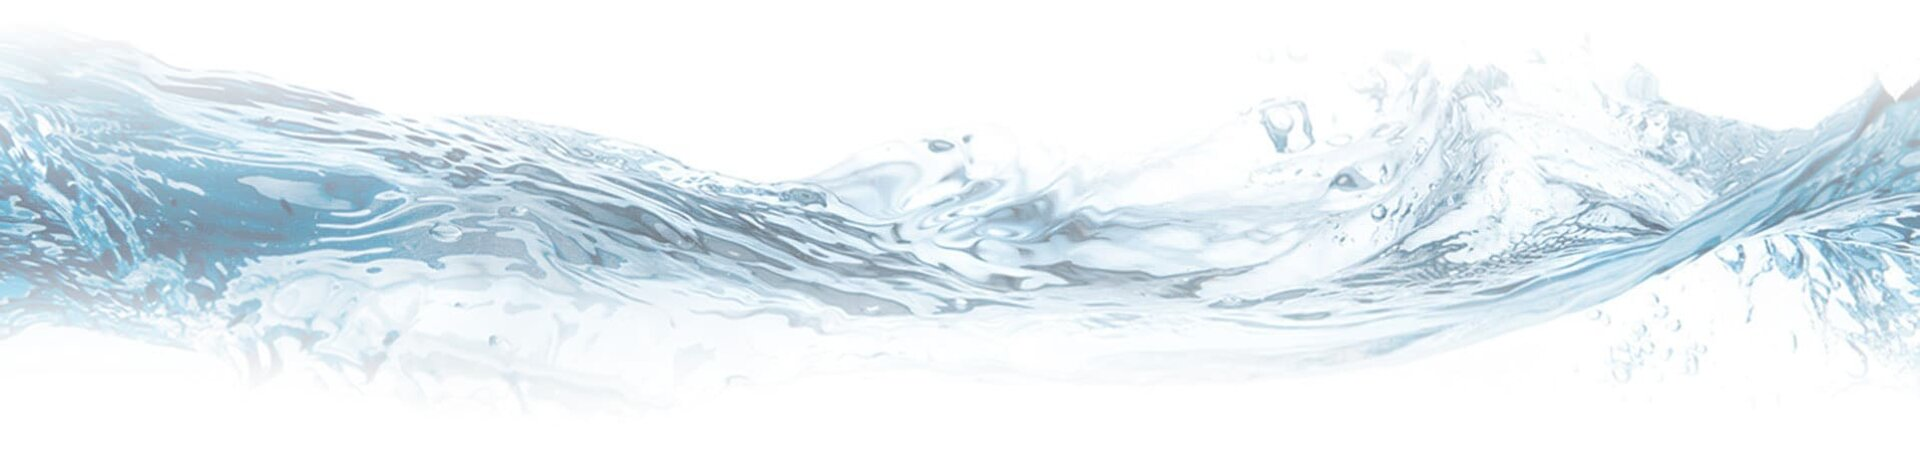 Water Splash MEIKO